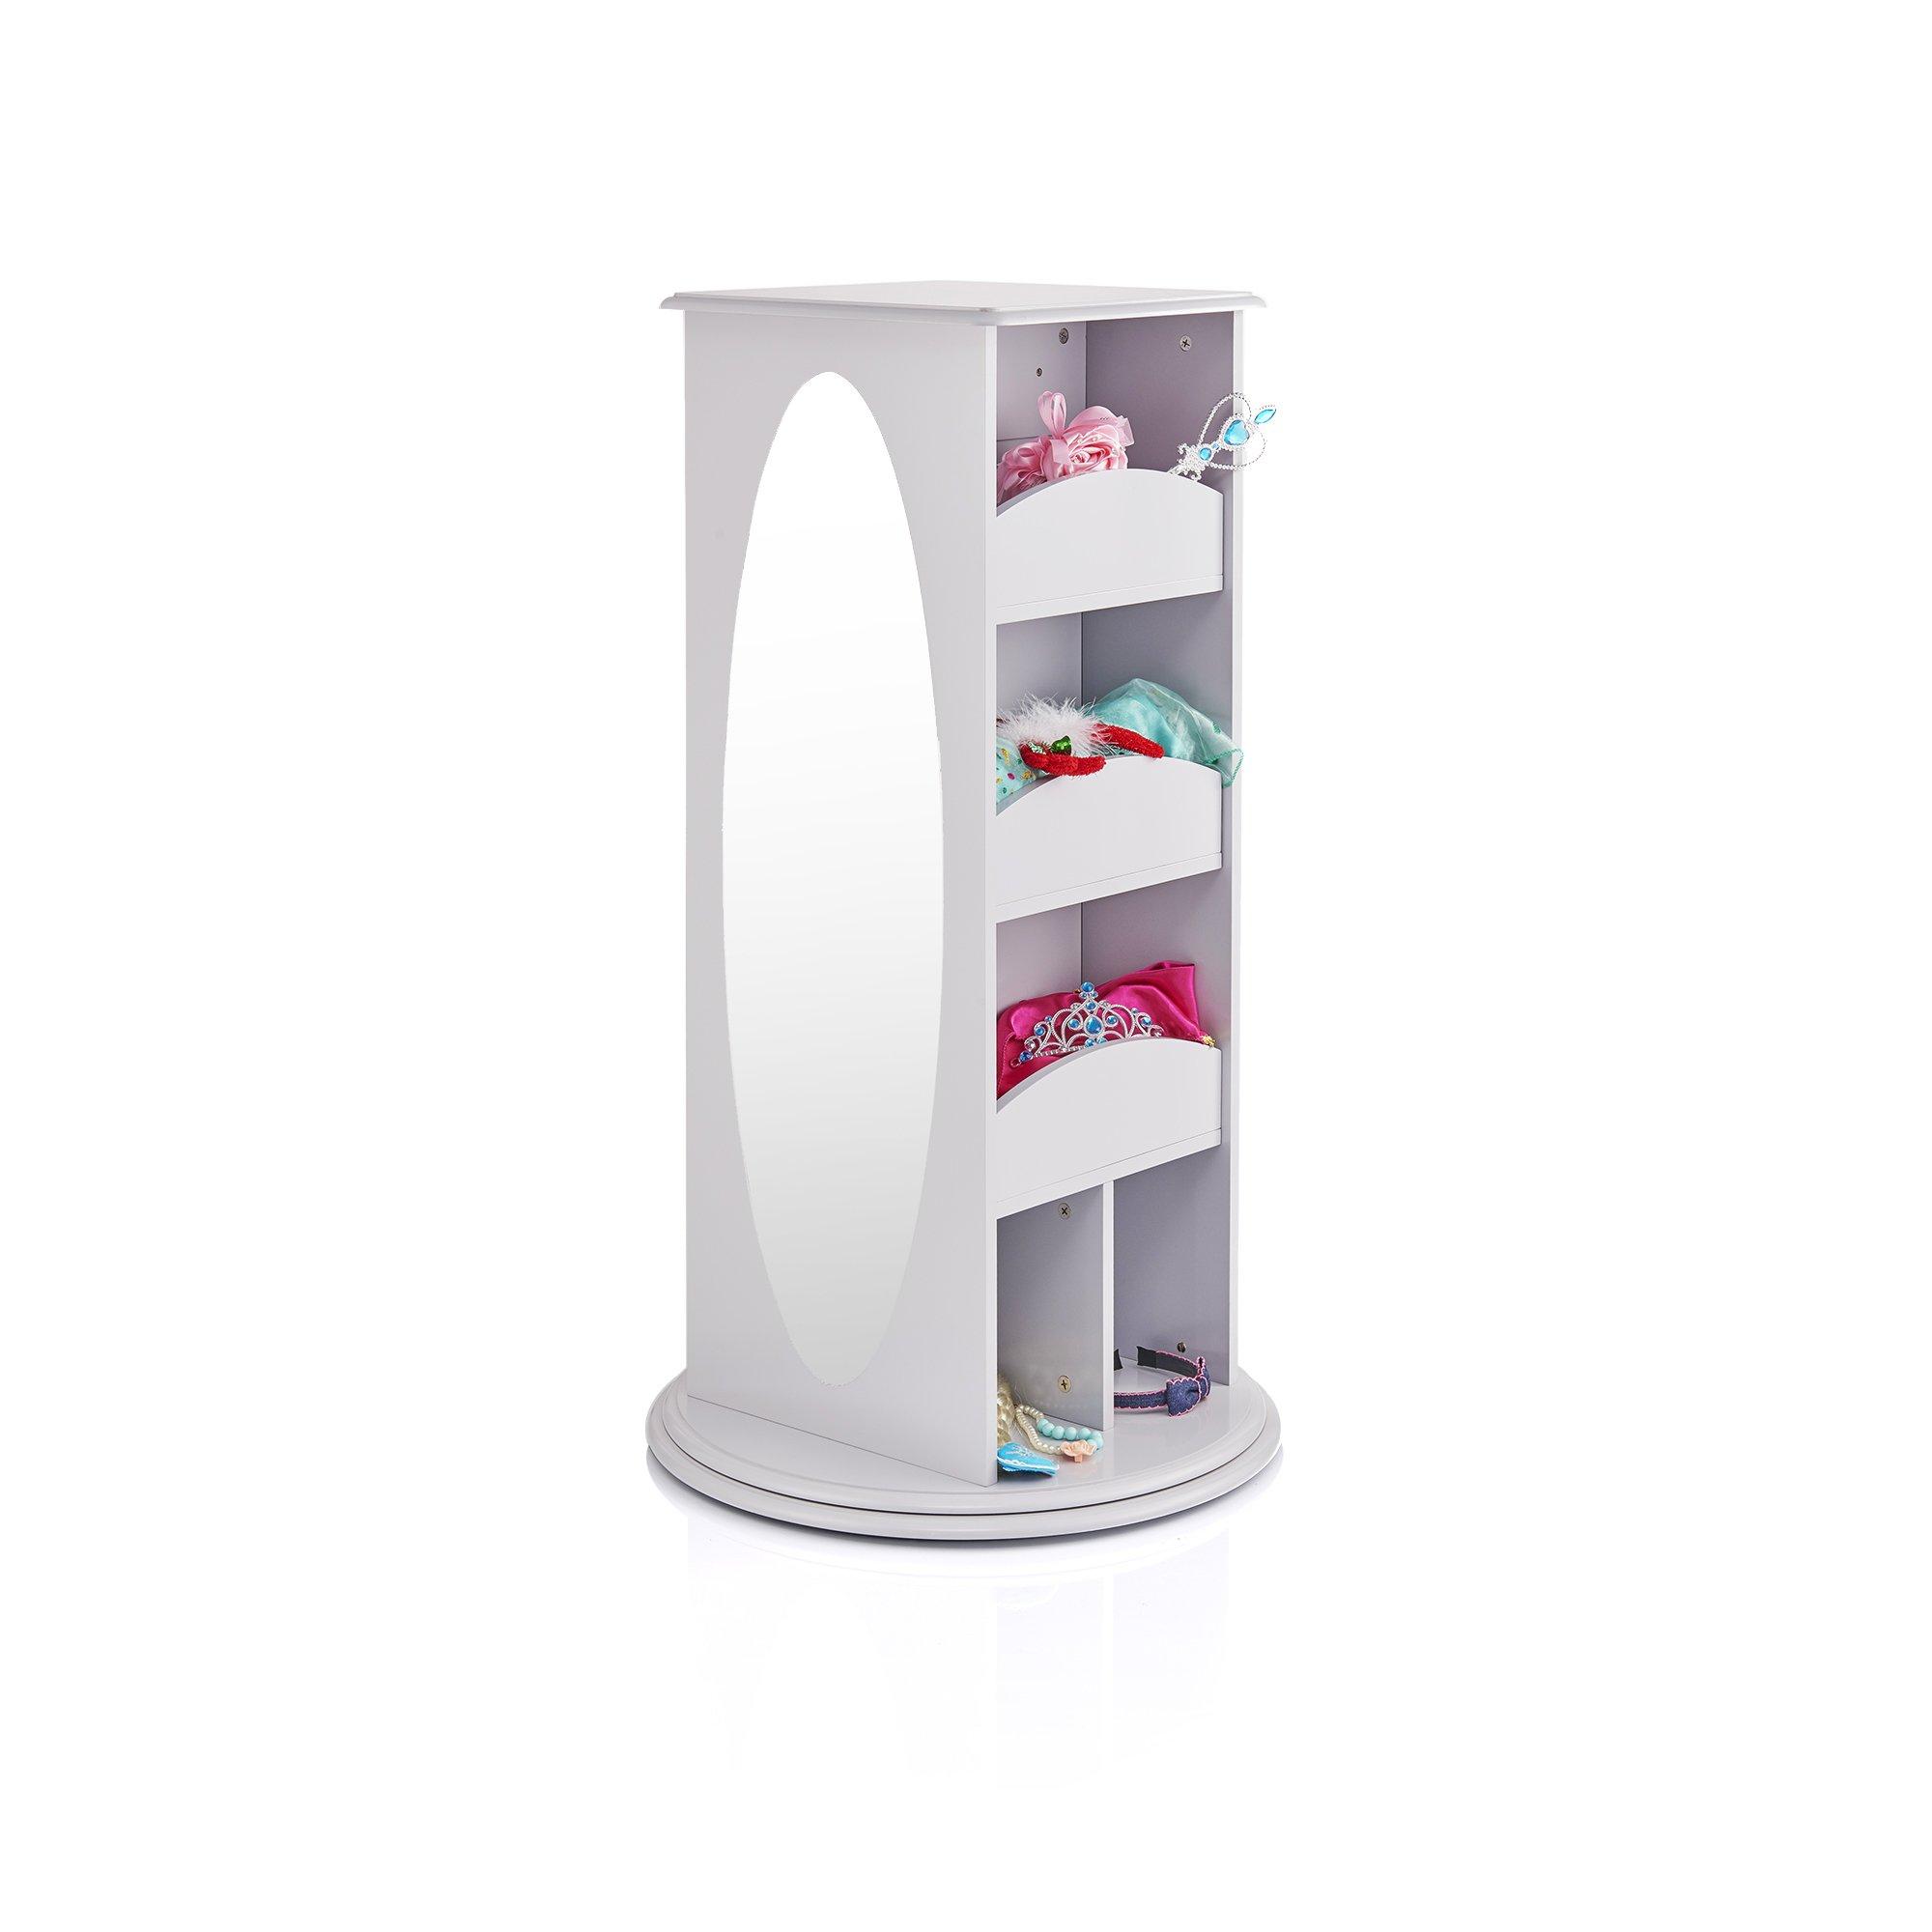 Guidecraft Rotating Dress Up Storage Center Grey - Armoire, Dresser Kids' Furniture by Guidecraft